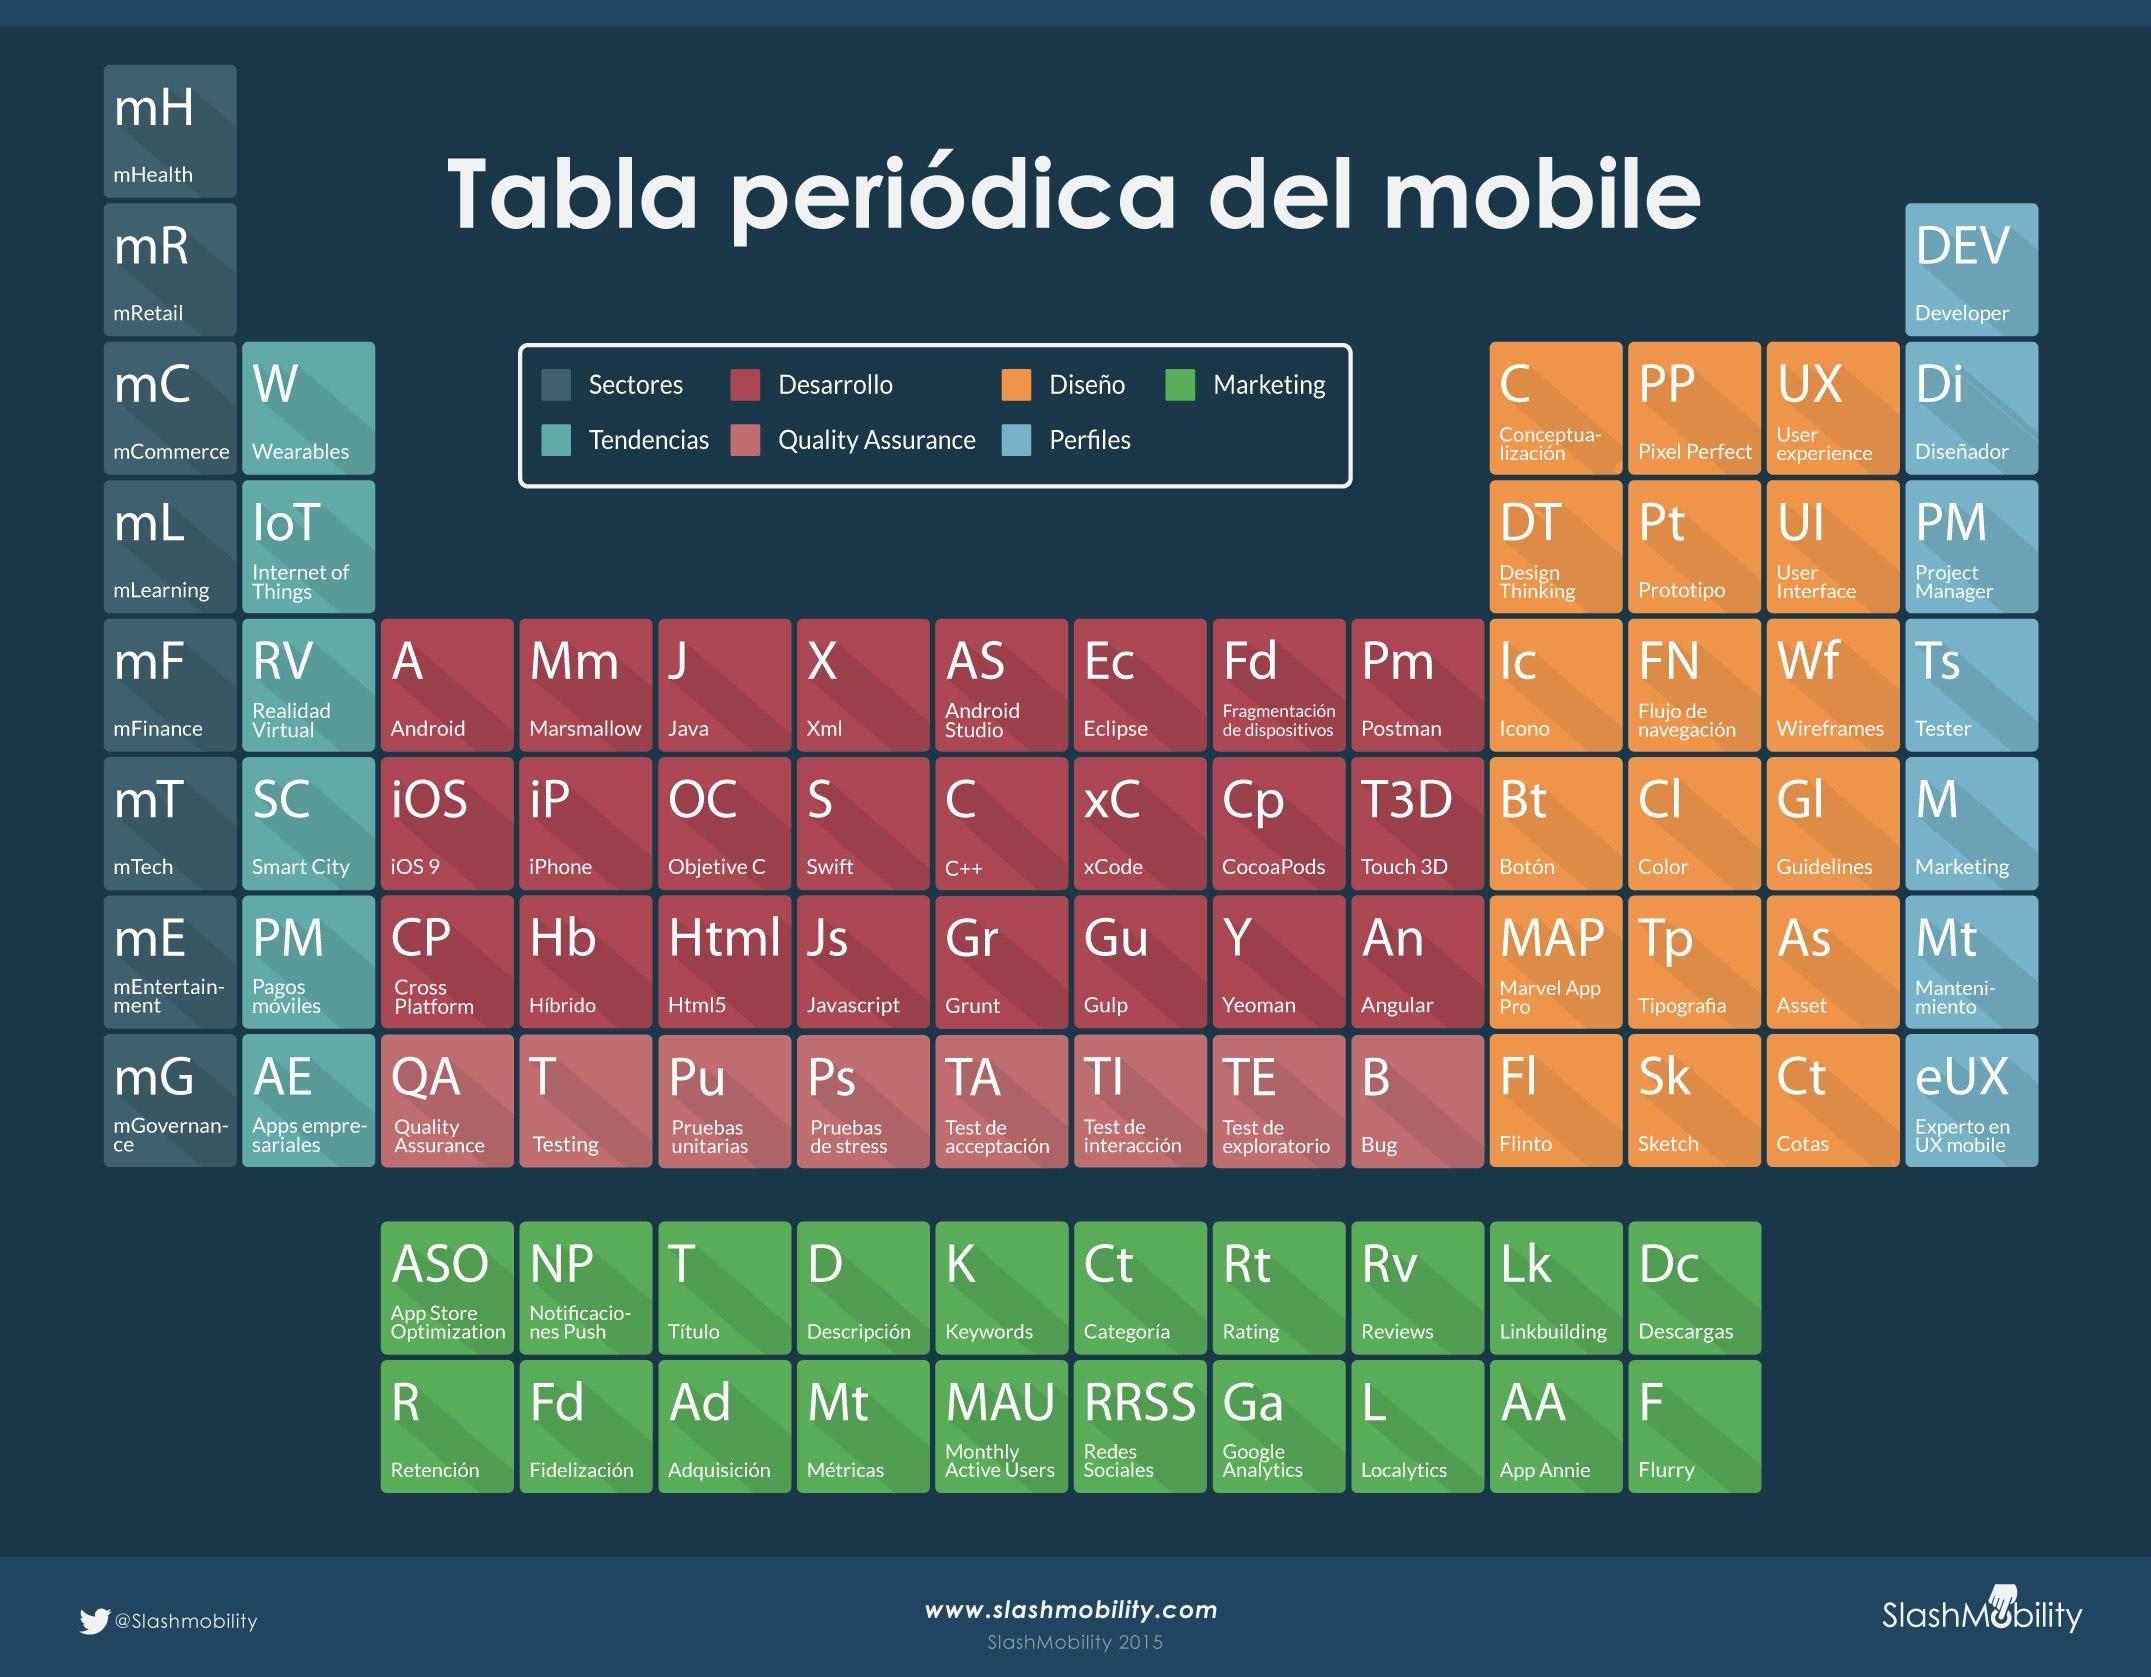 Tabla periodica mobile infografiag 21511677 mobile valora este post hola una infografa sobre la tabla peridica del mobile va un saludo anuncios relacionado urtaz Gallery